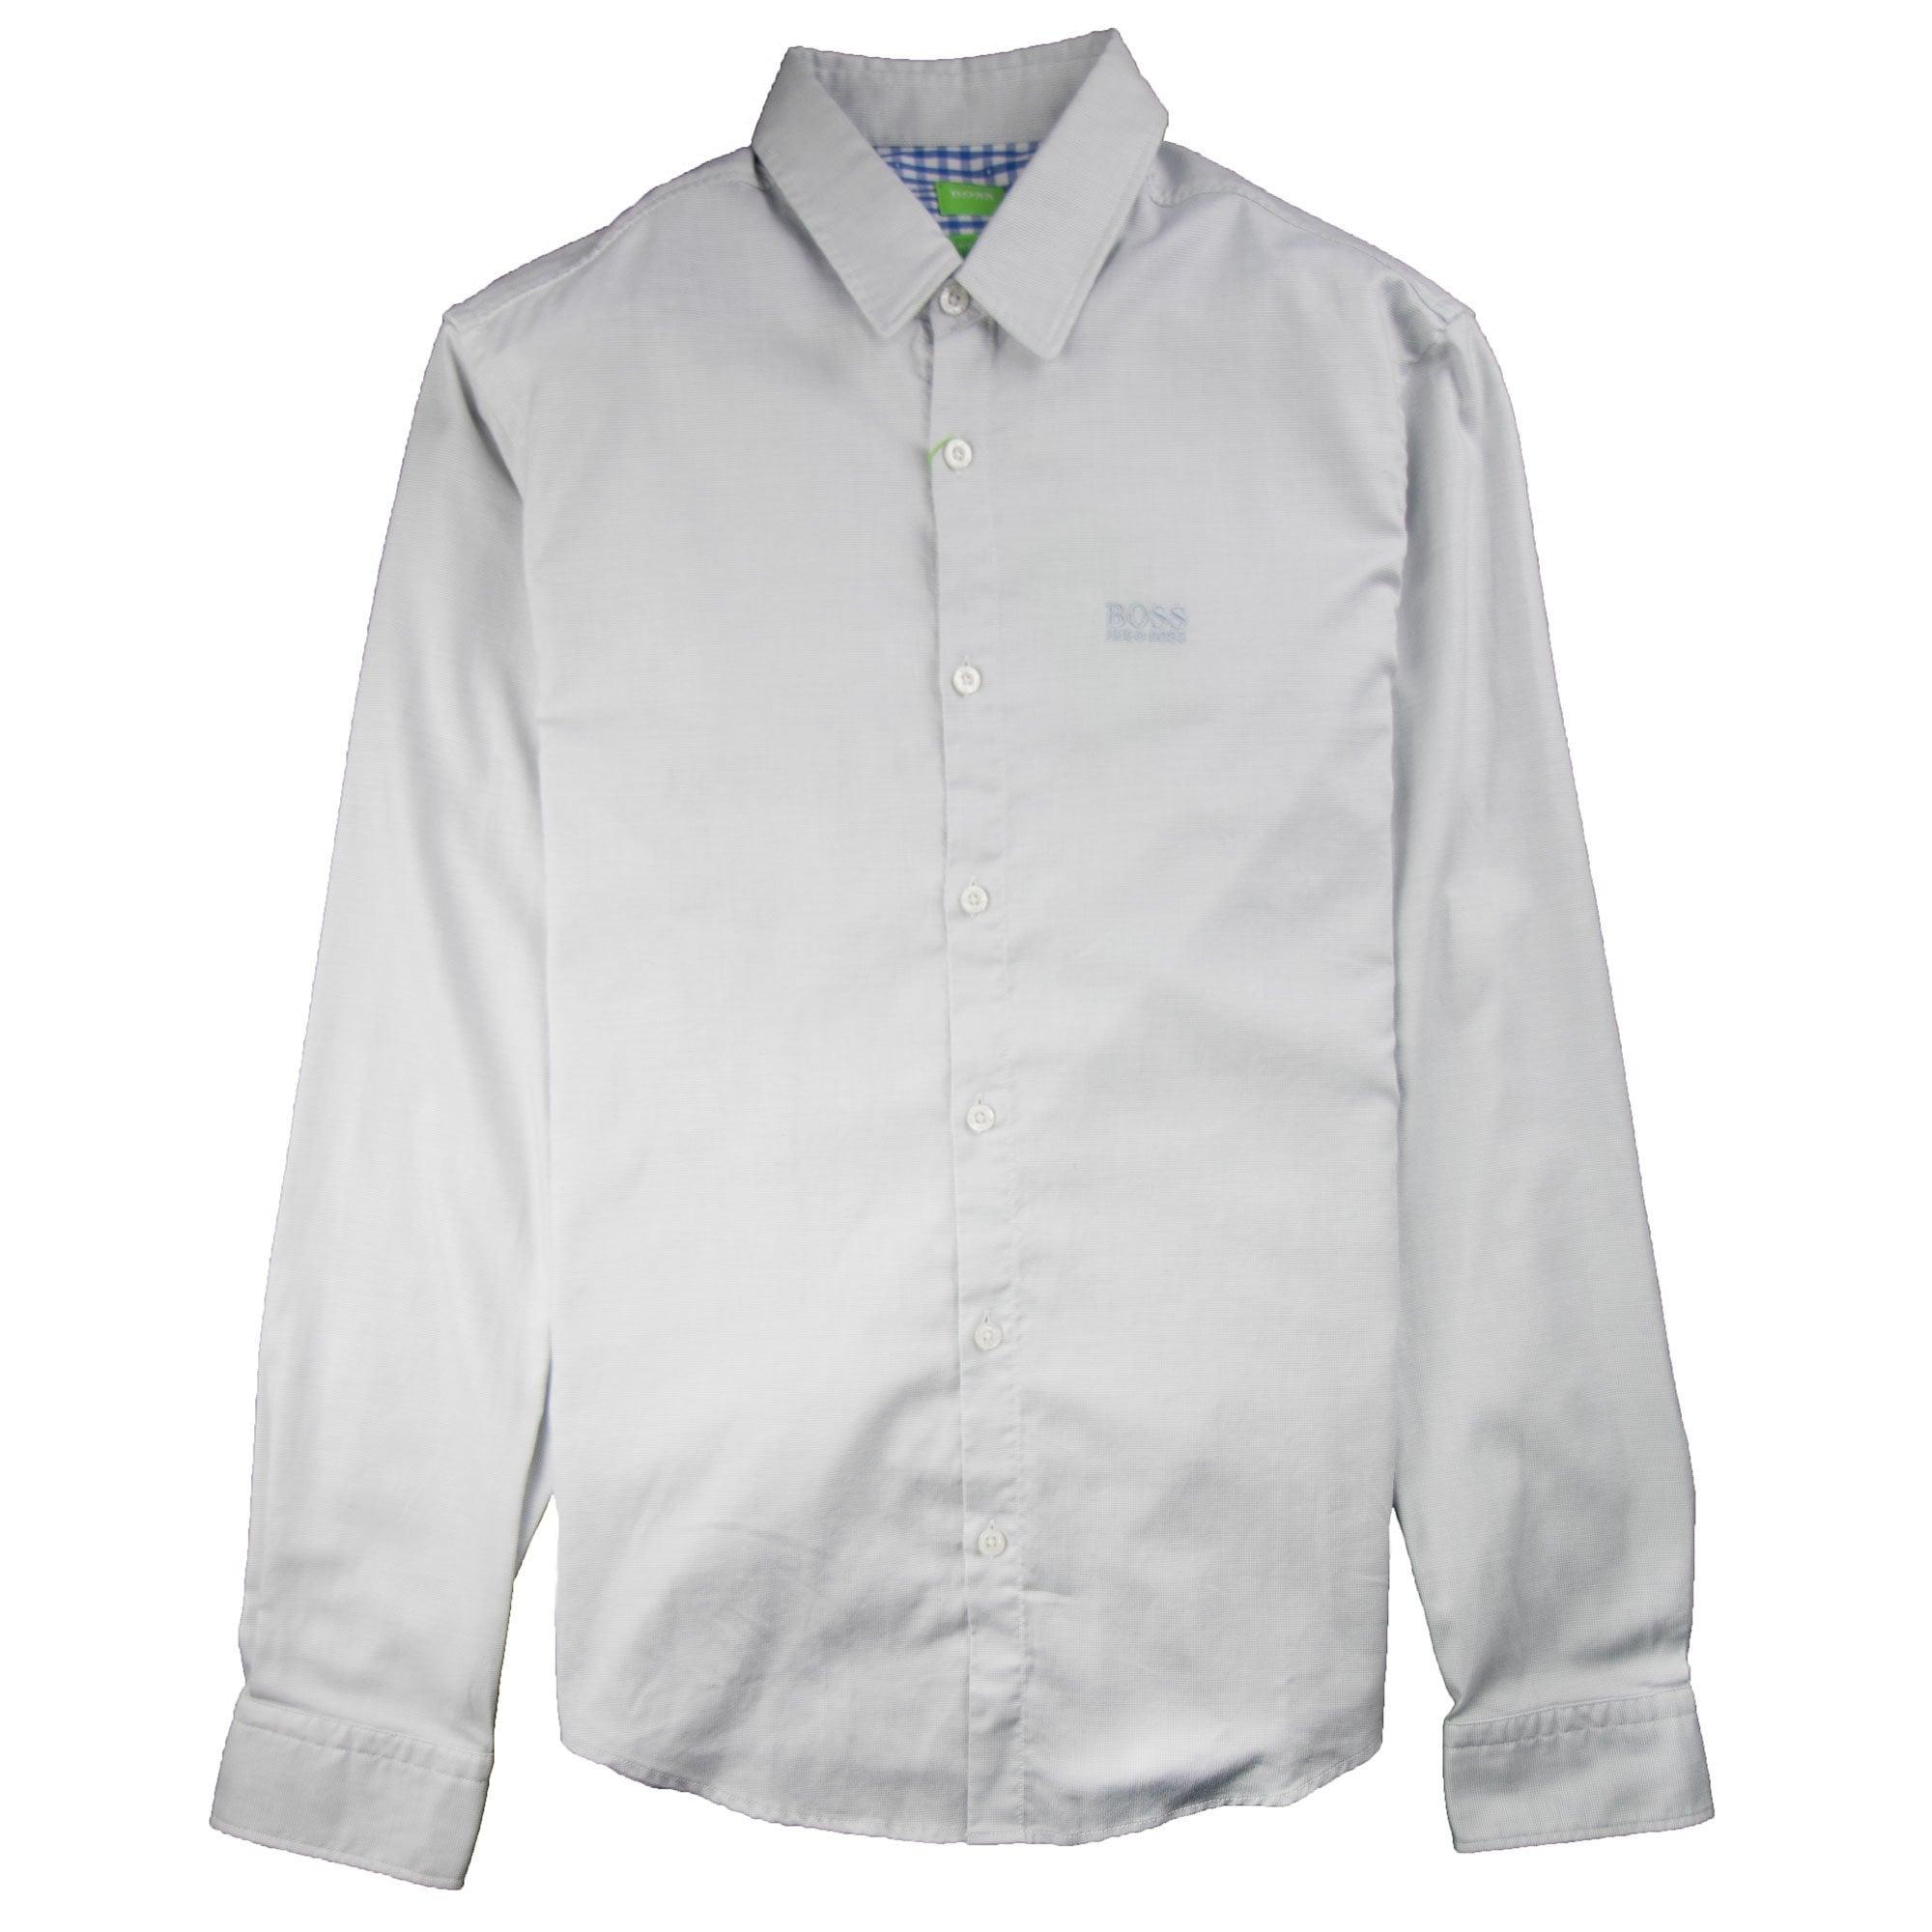 Hugo Boss C-Buster-R Long Sleeve Shirt Grey